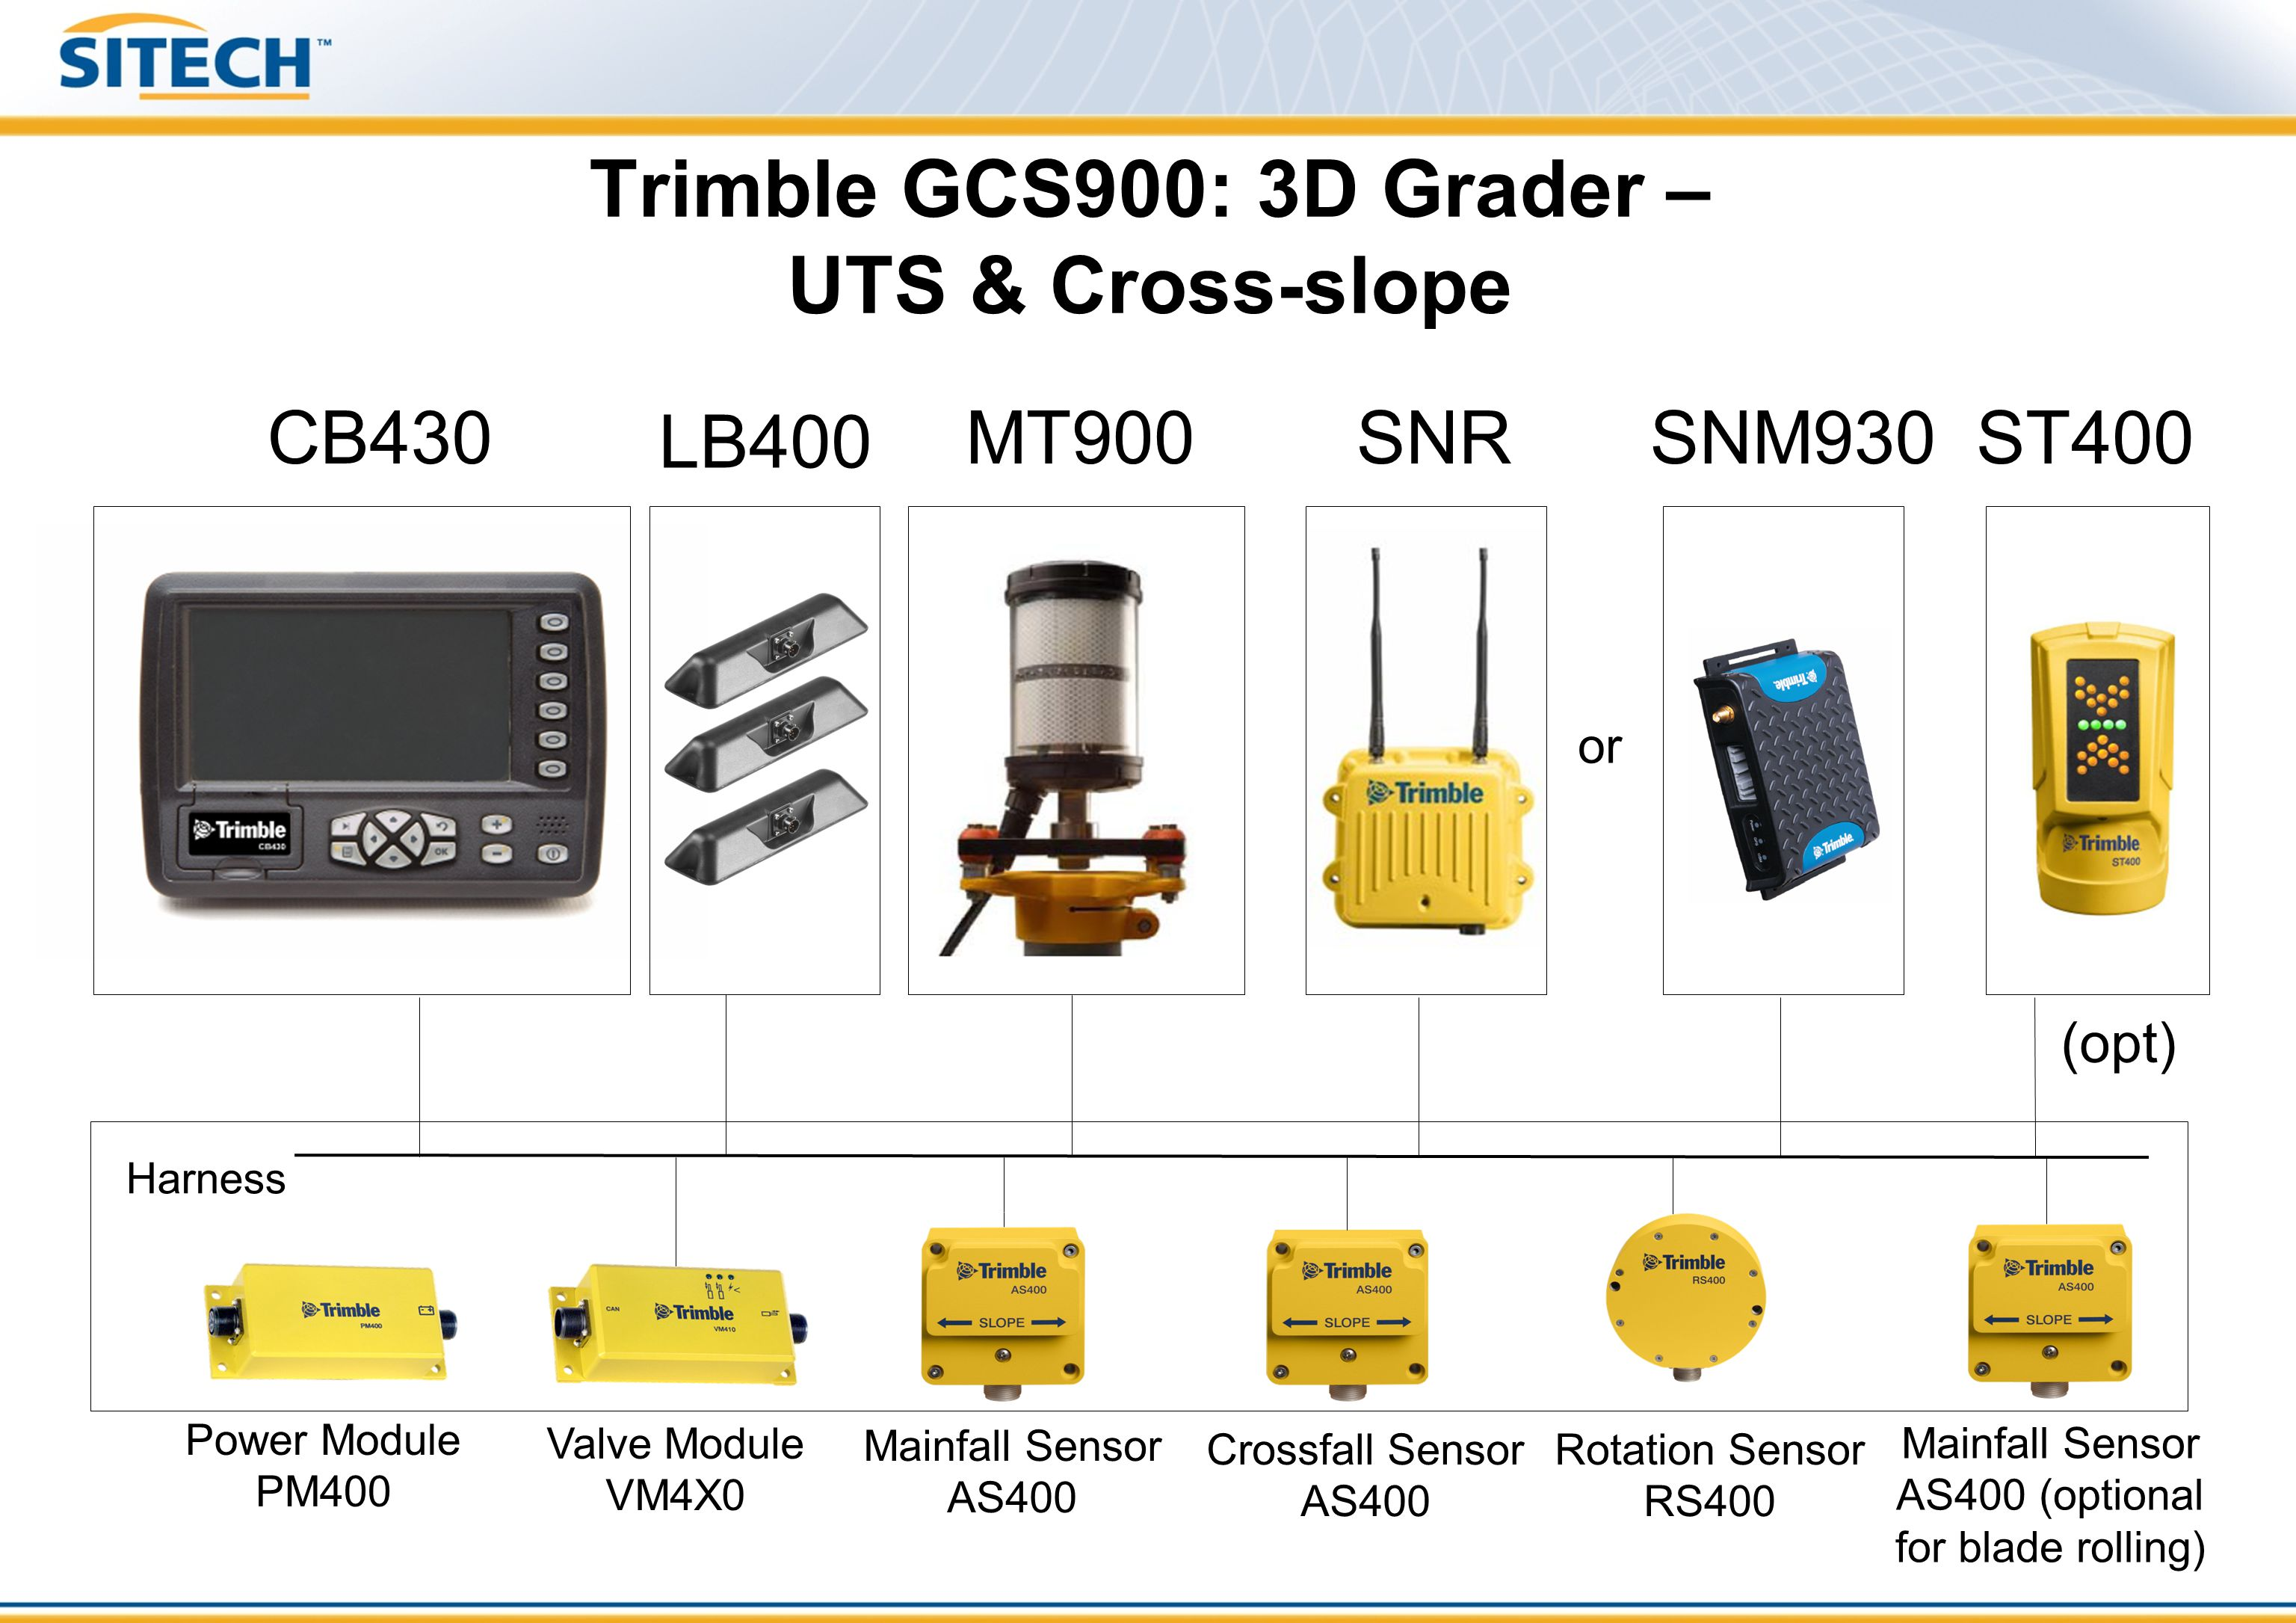 Trimble GCS900: 3D Grader – UTS & Cross-slope